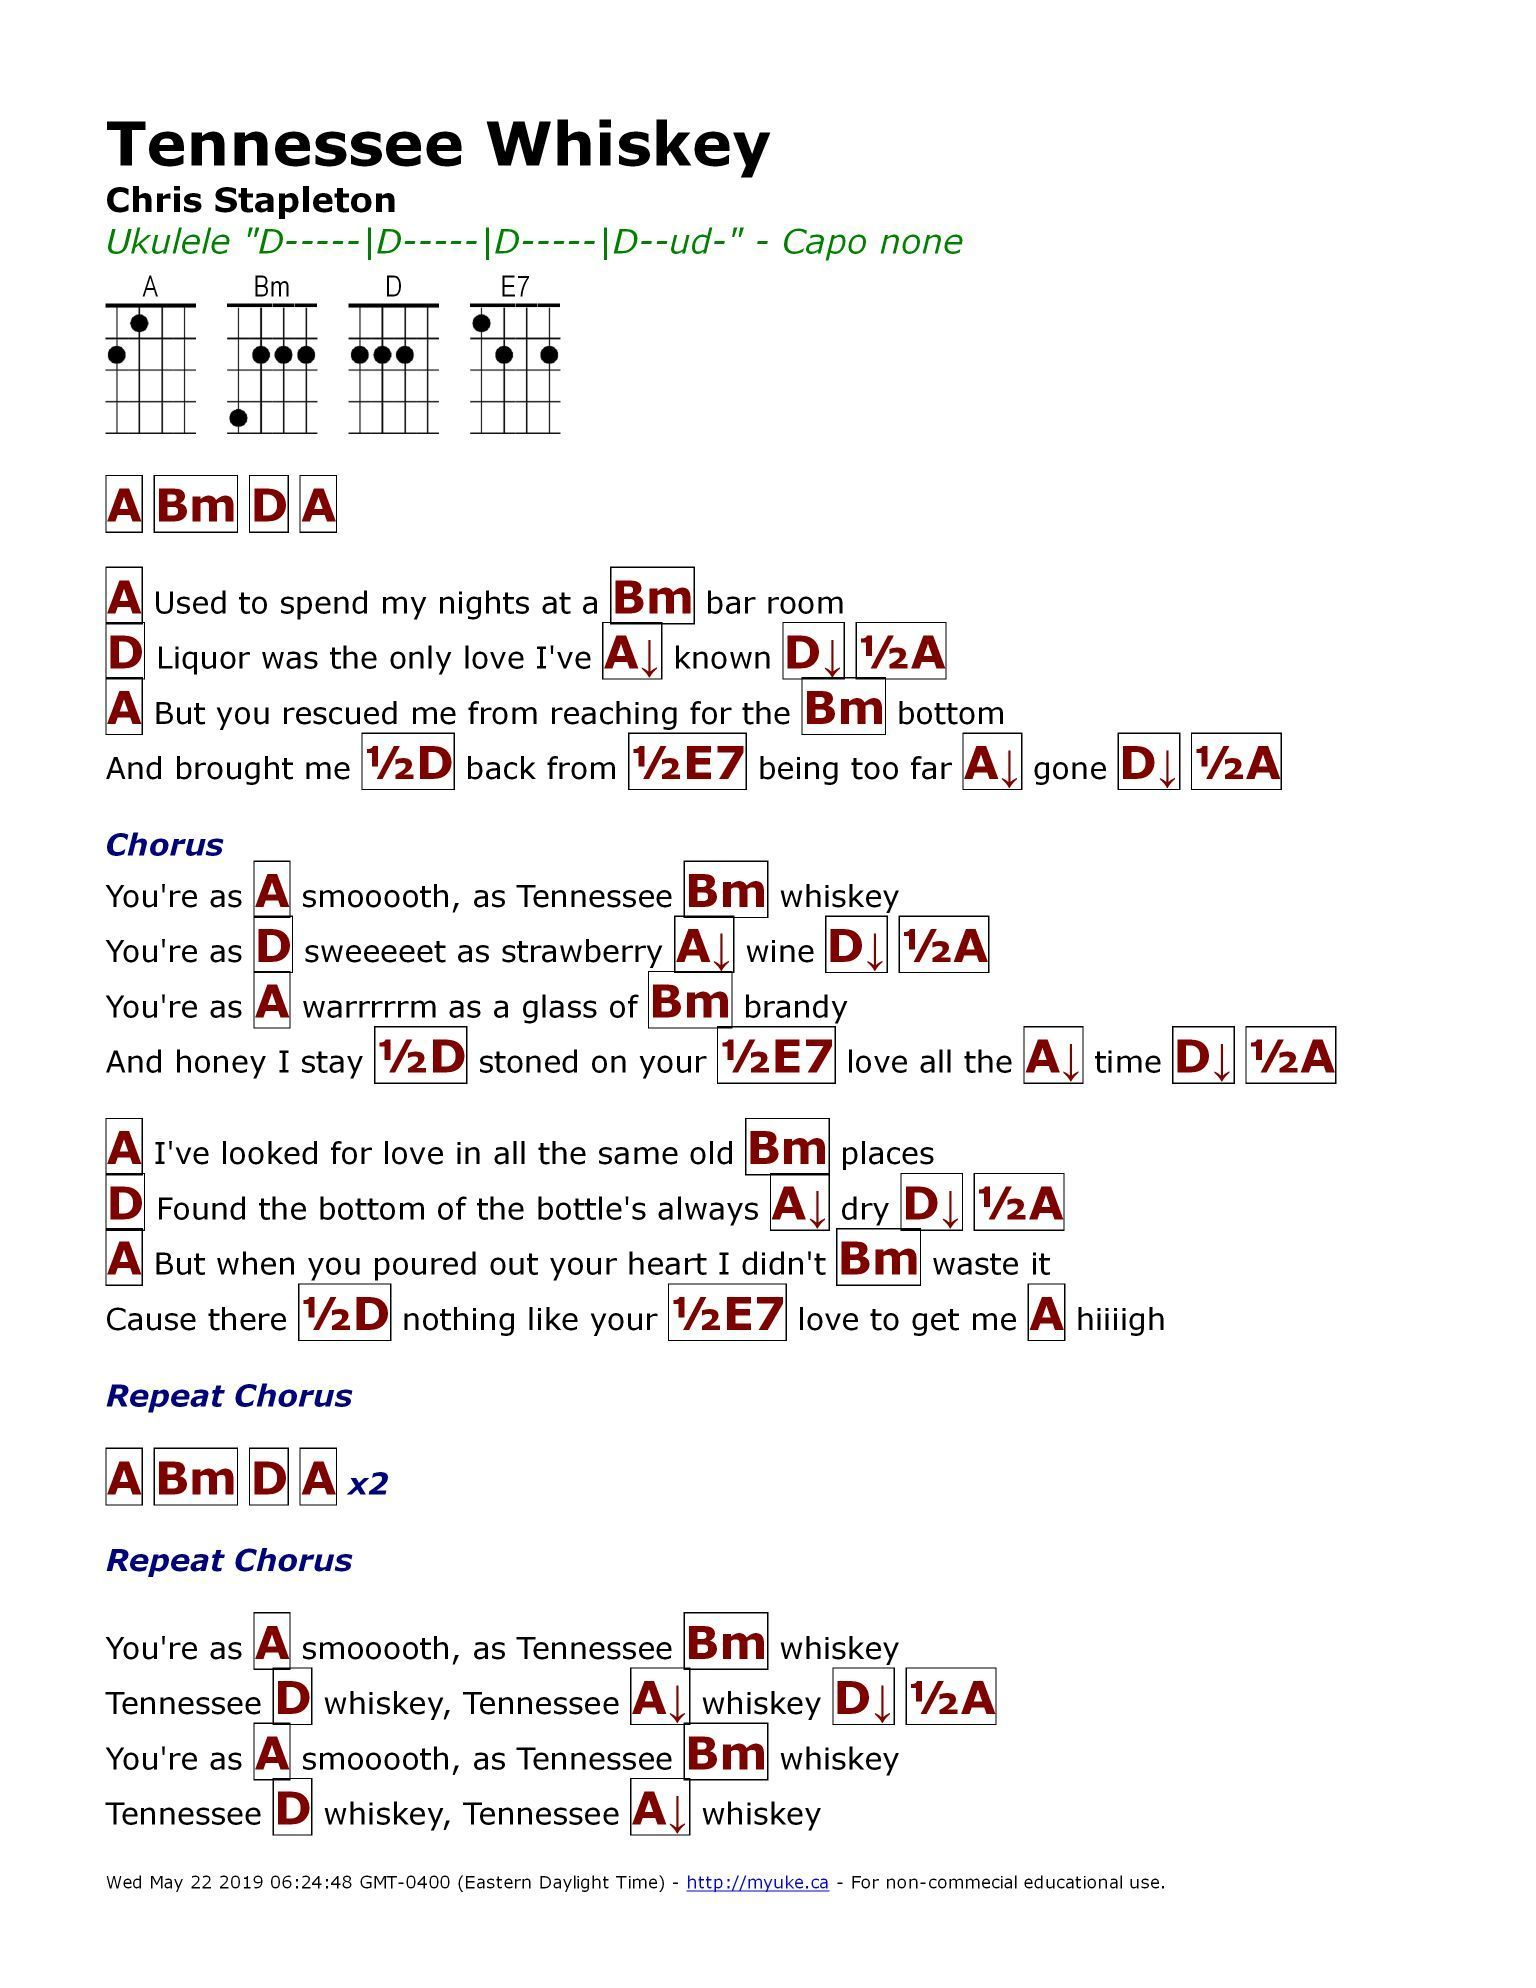 LearnToPlayGuitar | Ukulele chords songs, Guitar chords and lyrics ...